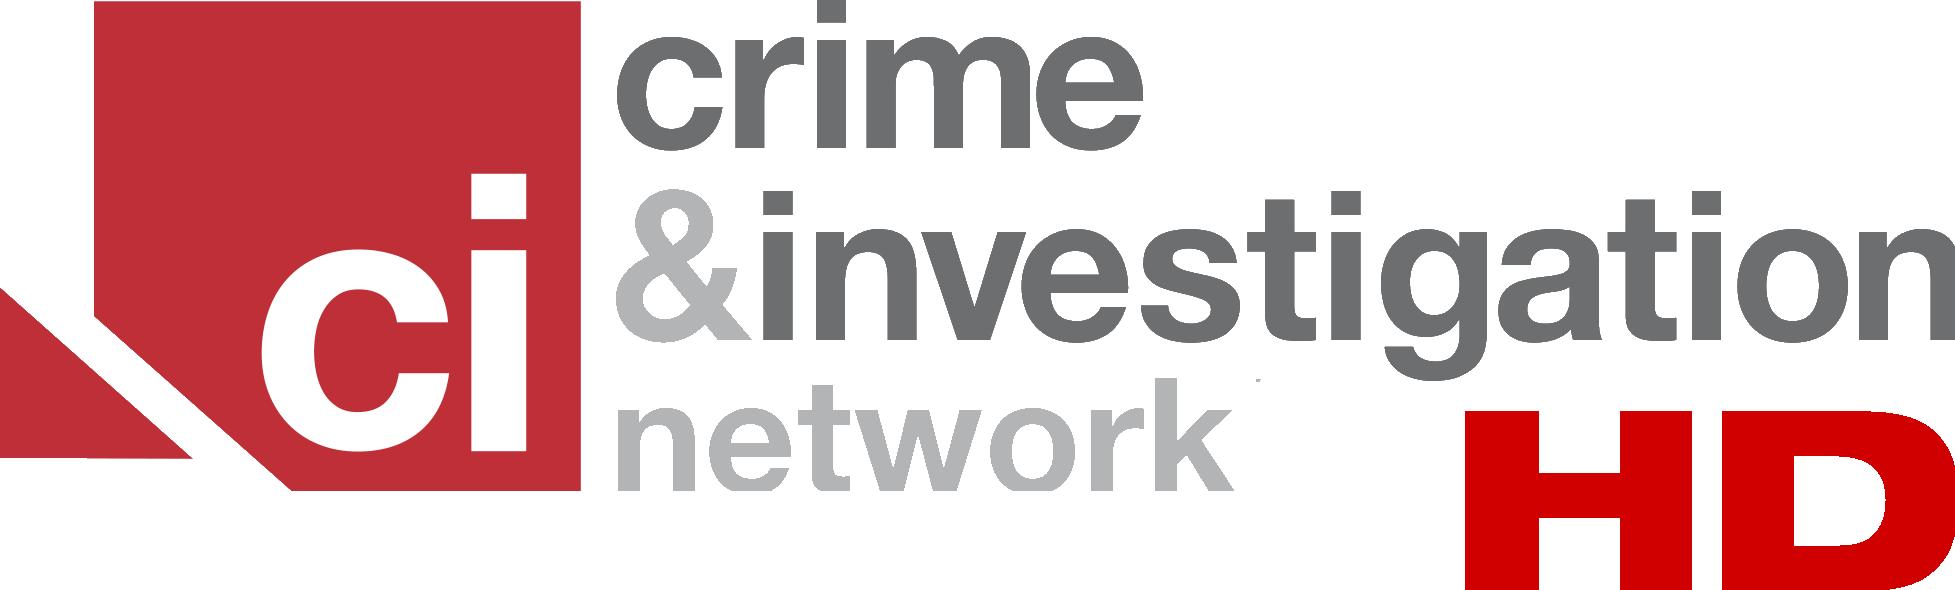 Image network hd png. Crime clipart crime investigation